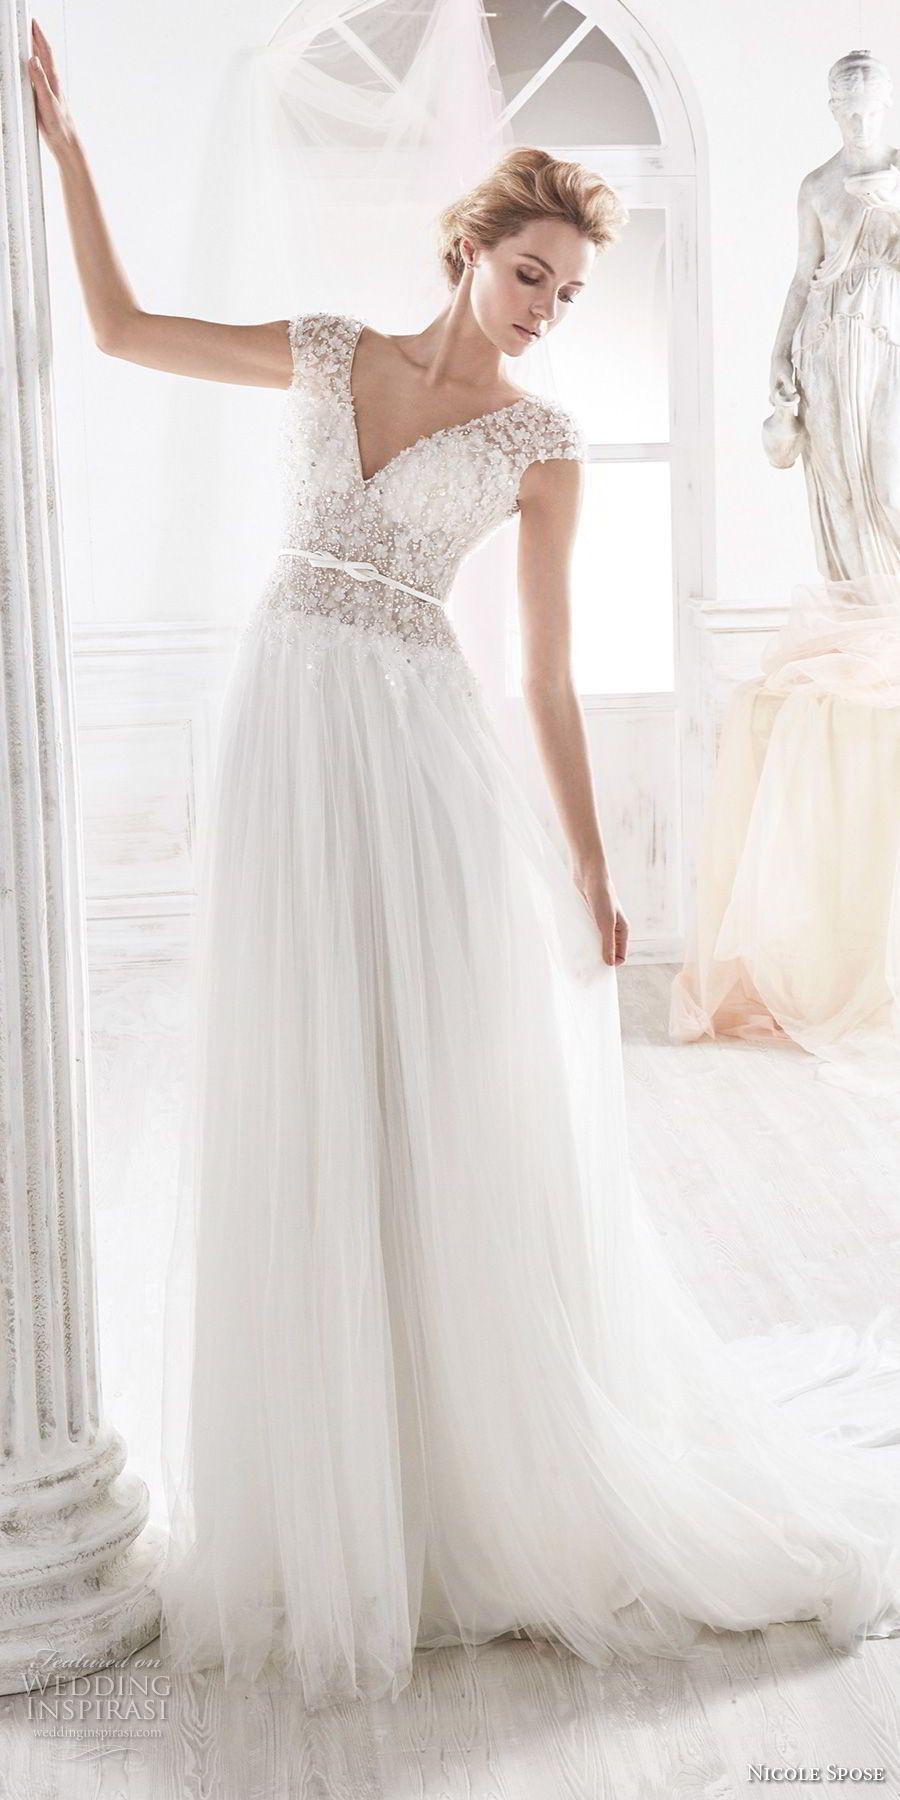 Nicole spose bridal cap sleeves v neck heavily embellished